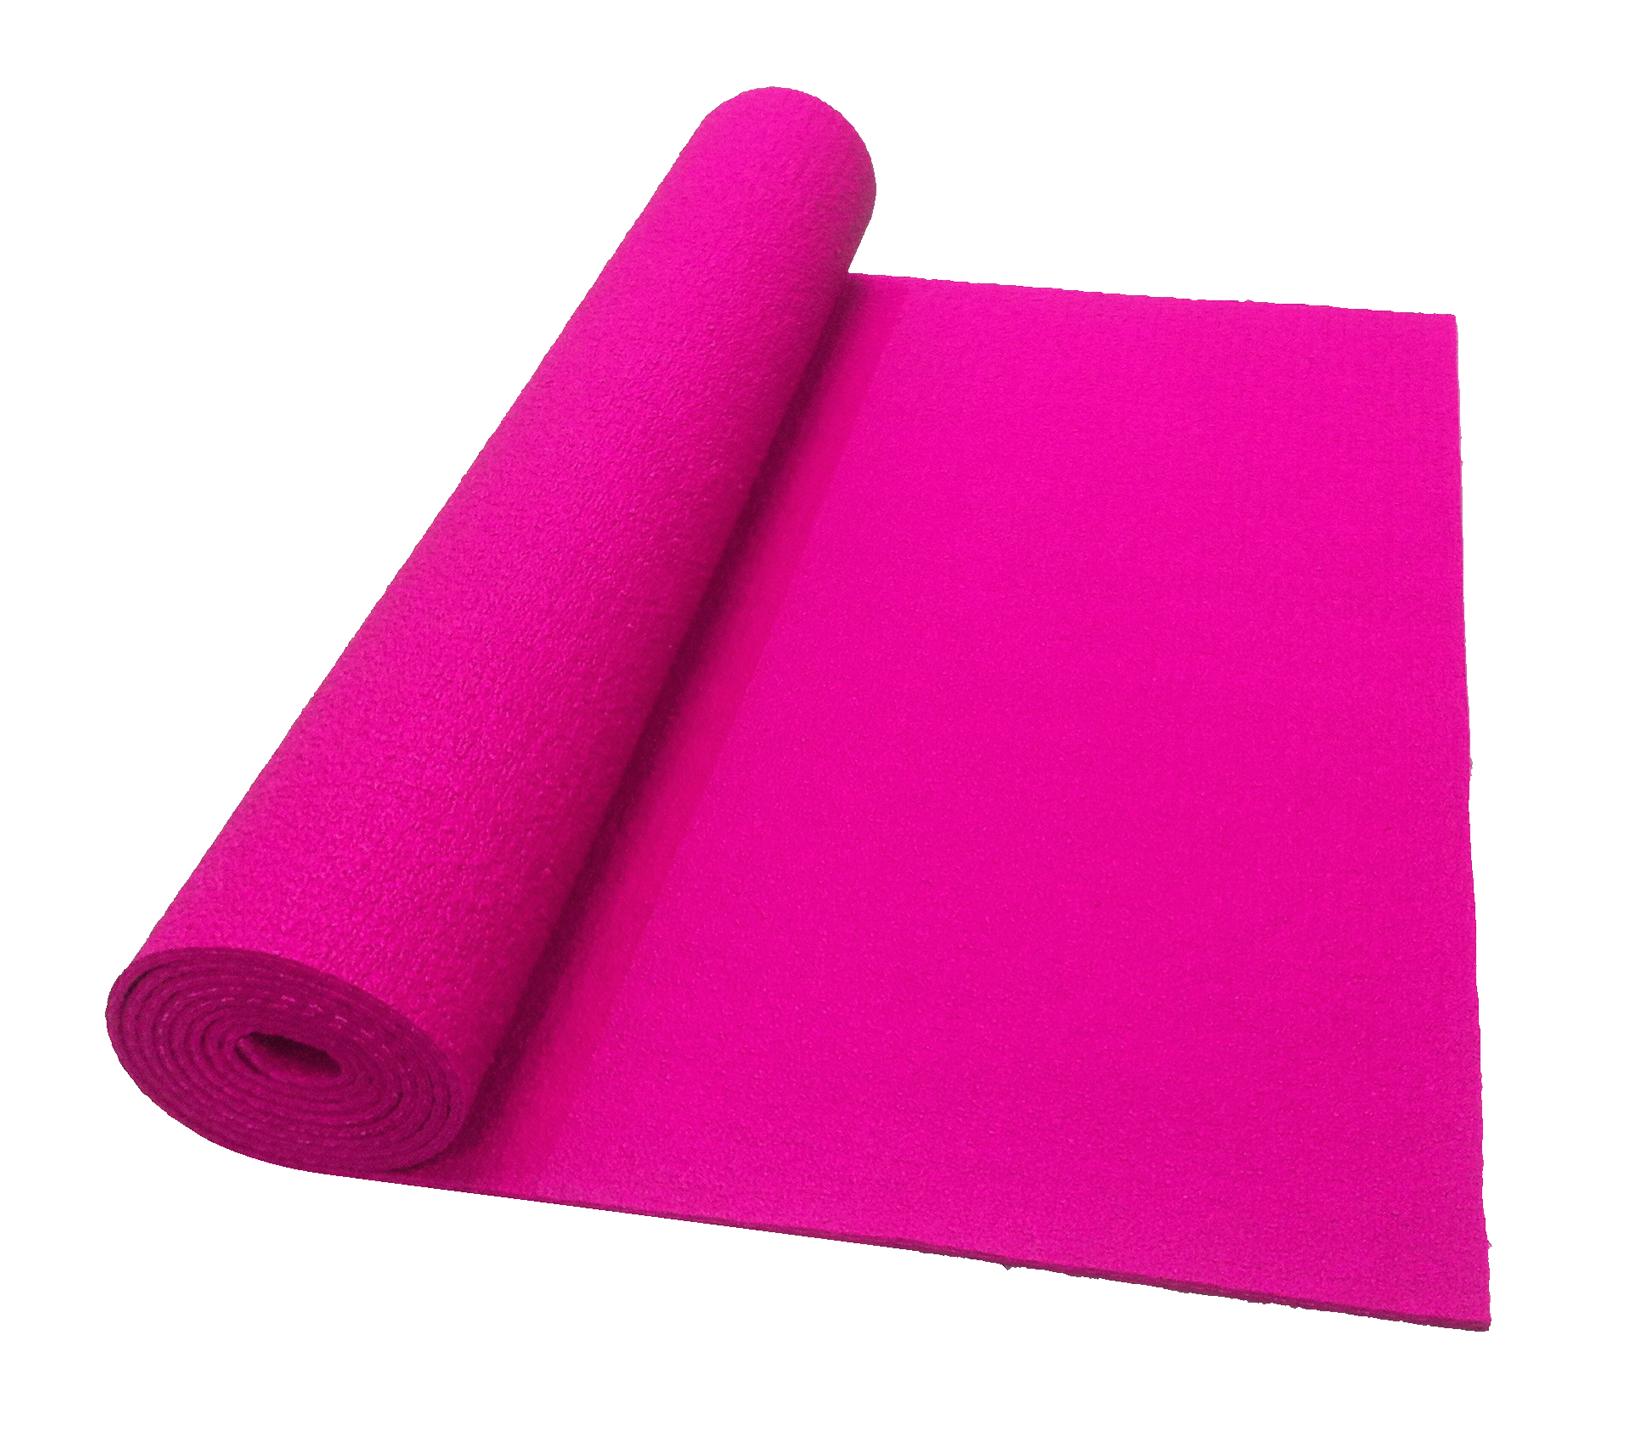 Download Free png Yoga Mat PNG Transparent Image 2.